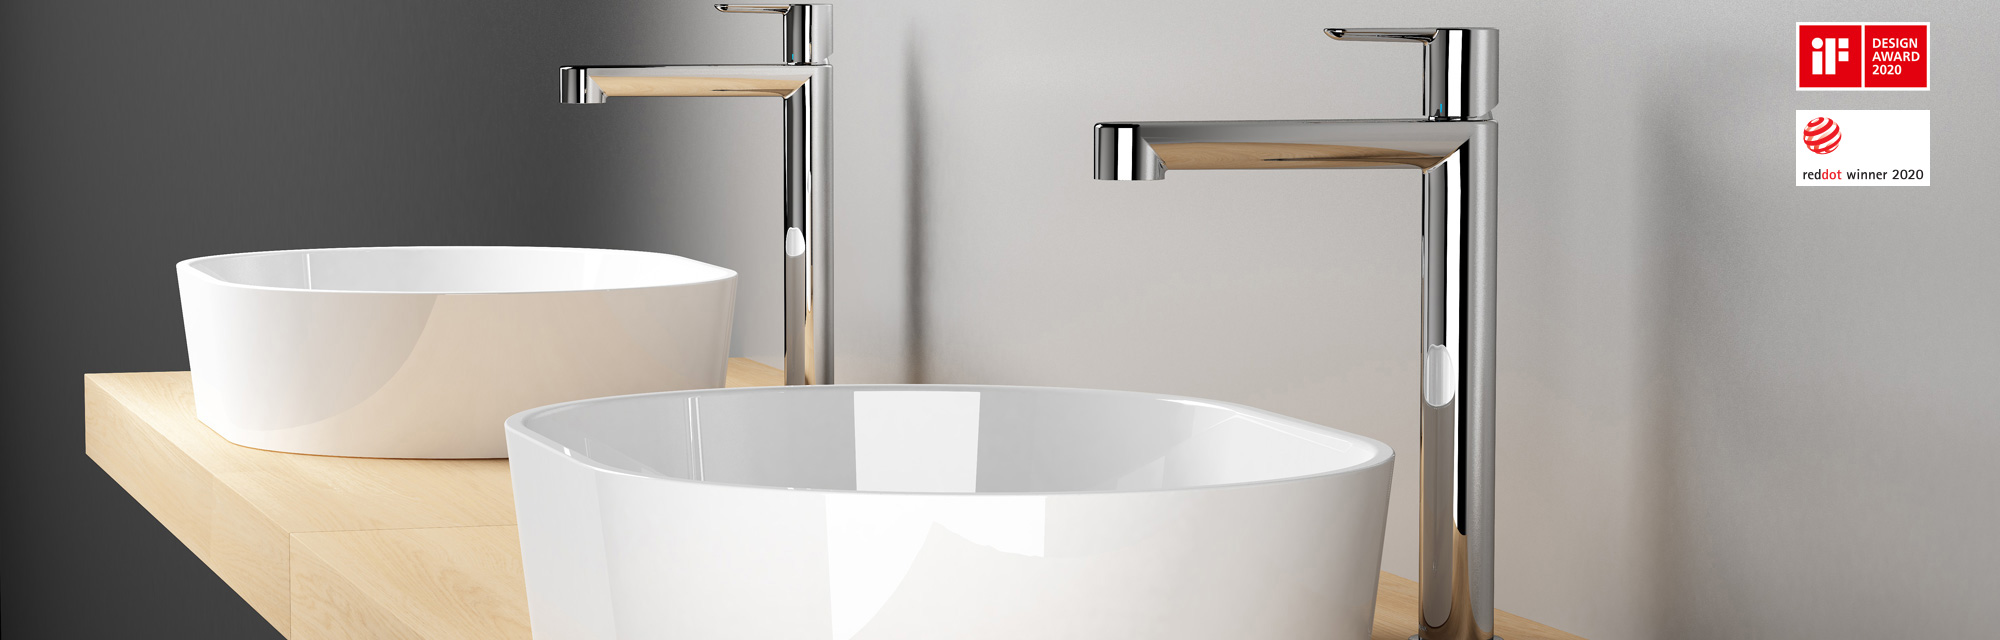 Cabine Salle De Bain Complete ravak a.s. - ma salle de bains